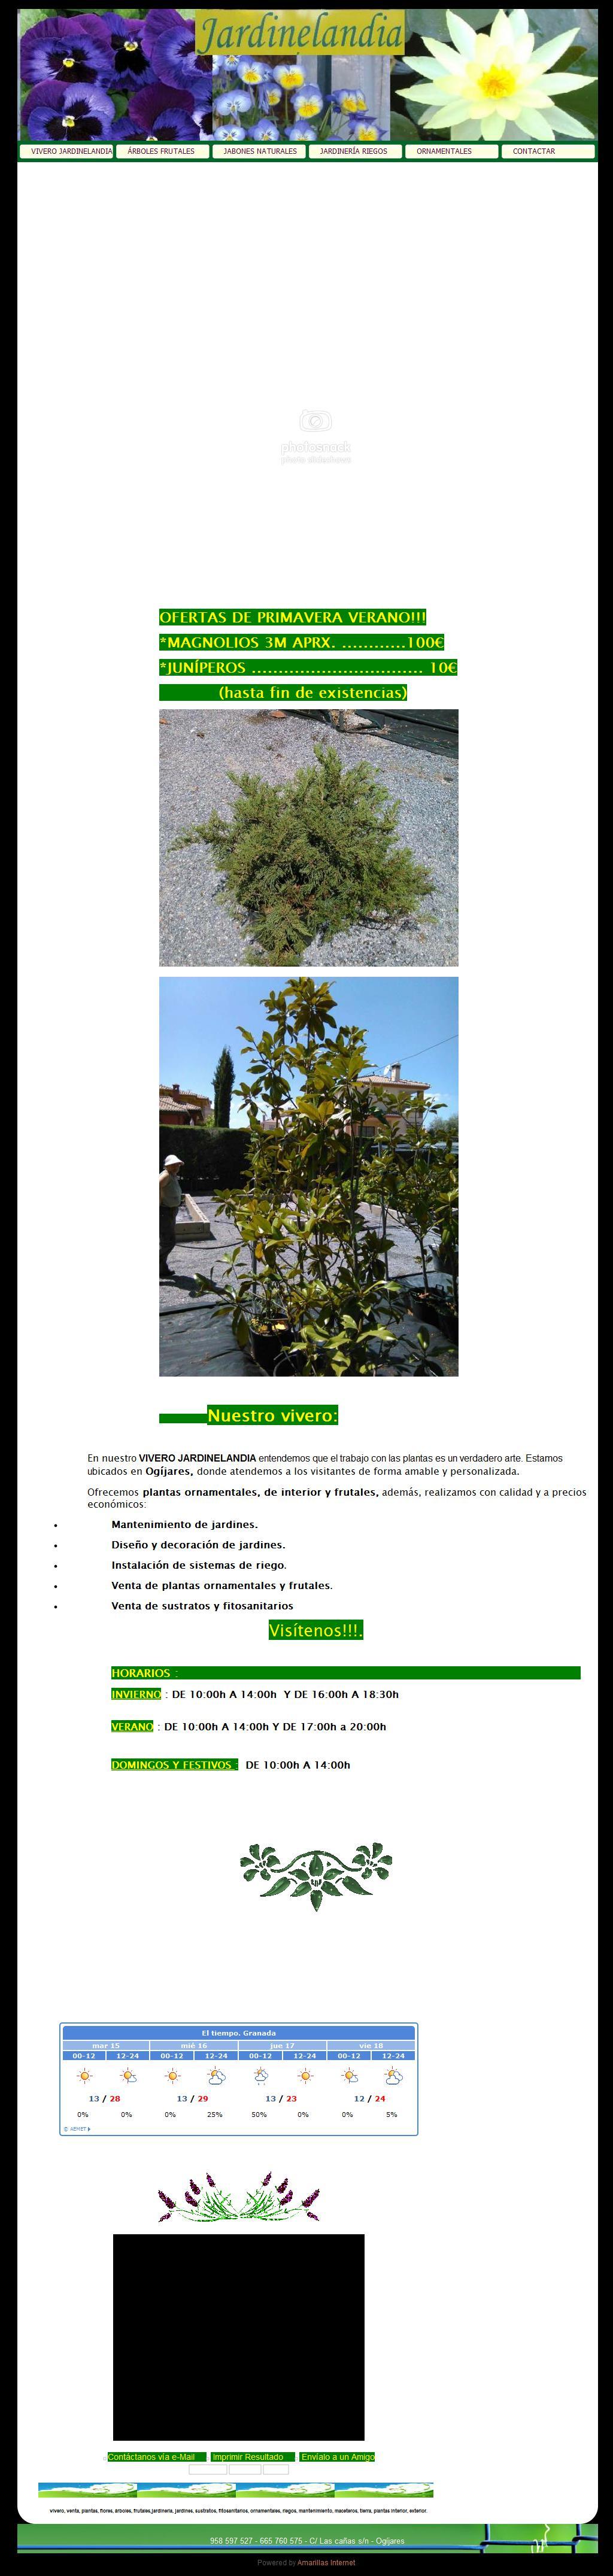 Vivero jardinelandia centro de jardineria dise o de - Centros de jardineria madrid ...